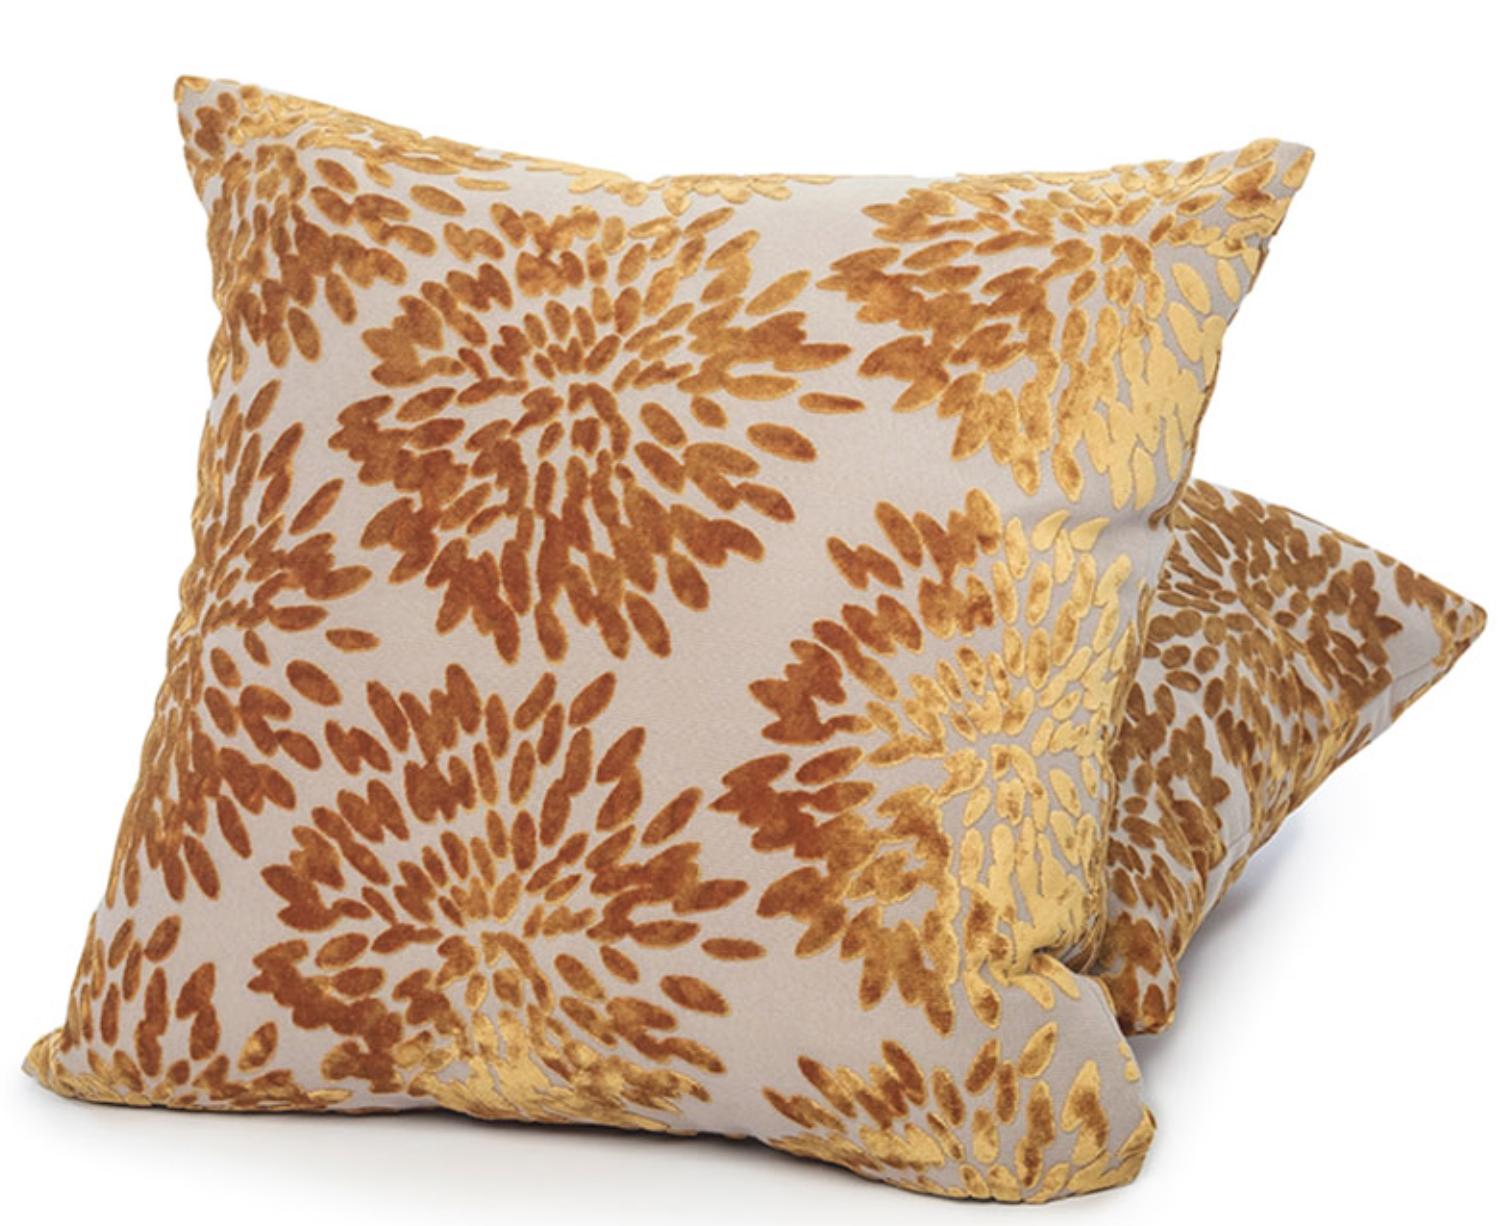 {Chrysanthemum pillow from  Ritz Carlton shops .}